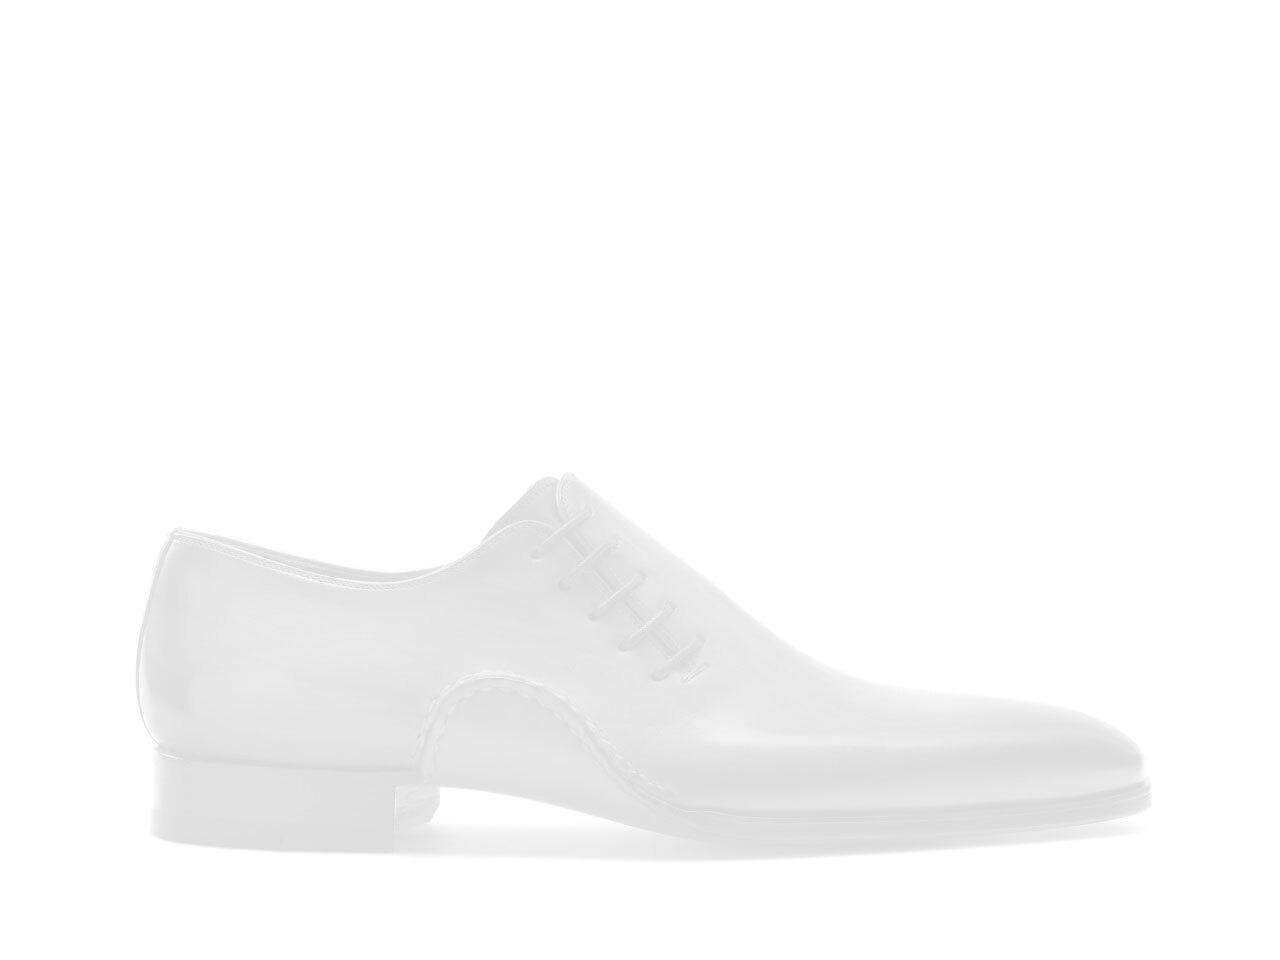 Sole of the Magnanni Plaka Cuero Men's Derby Shoes